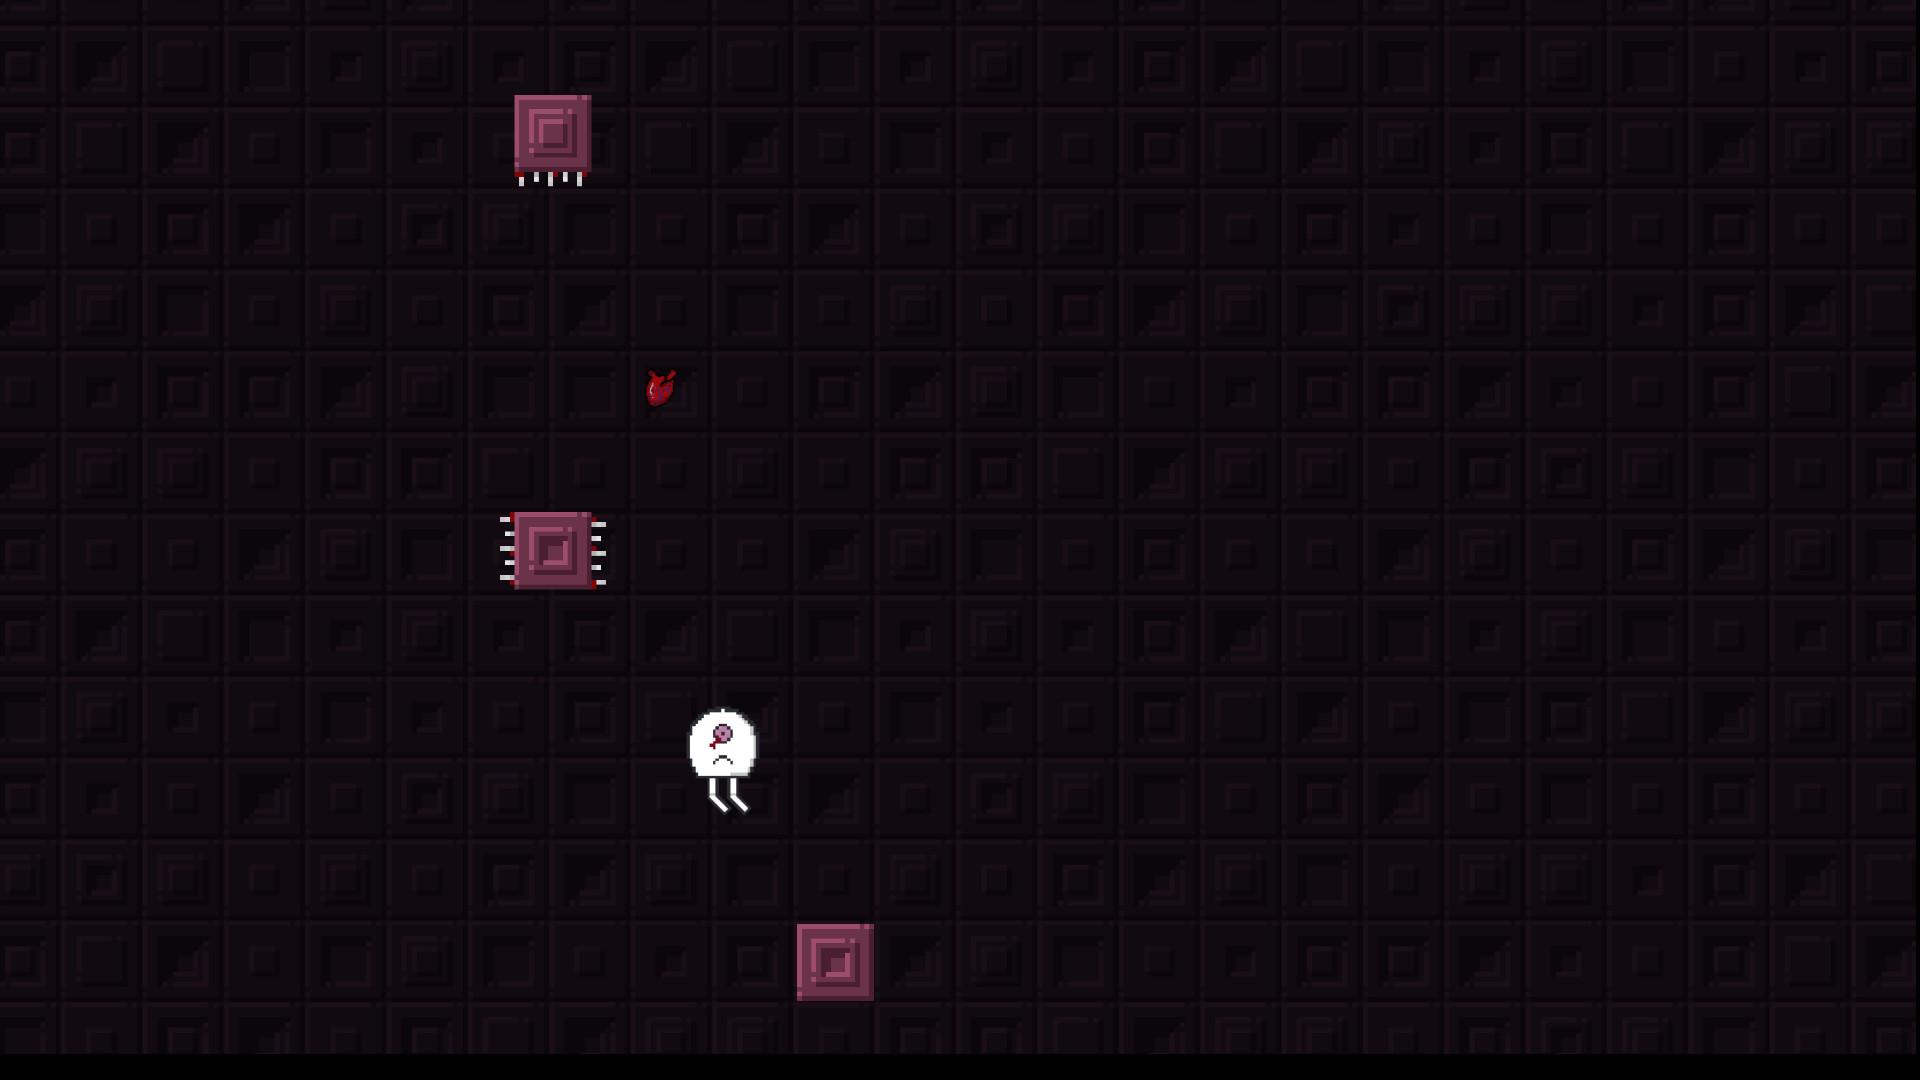 The Thirst of Hearts screenshot